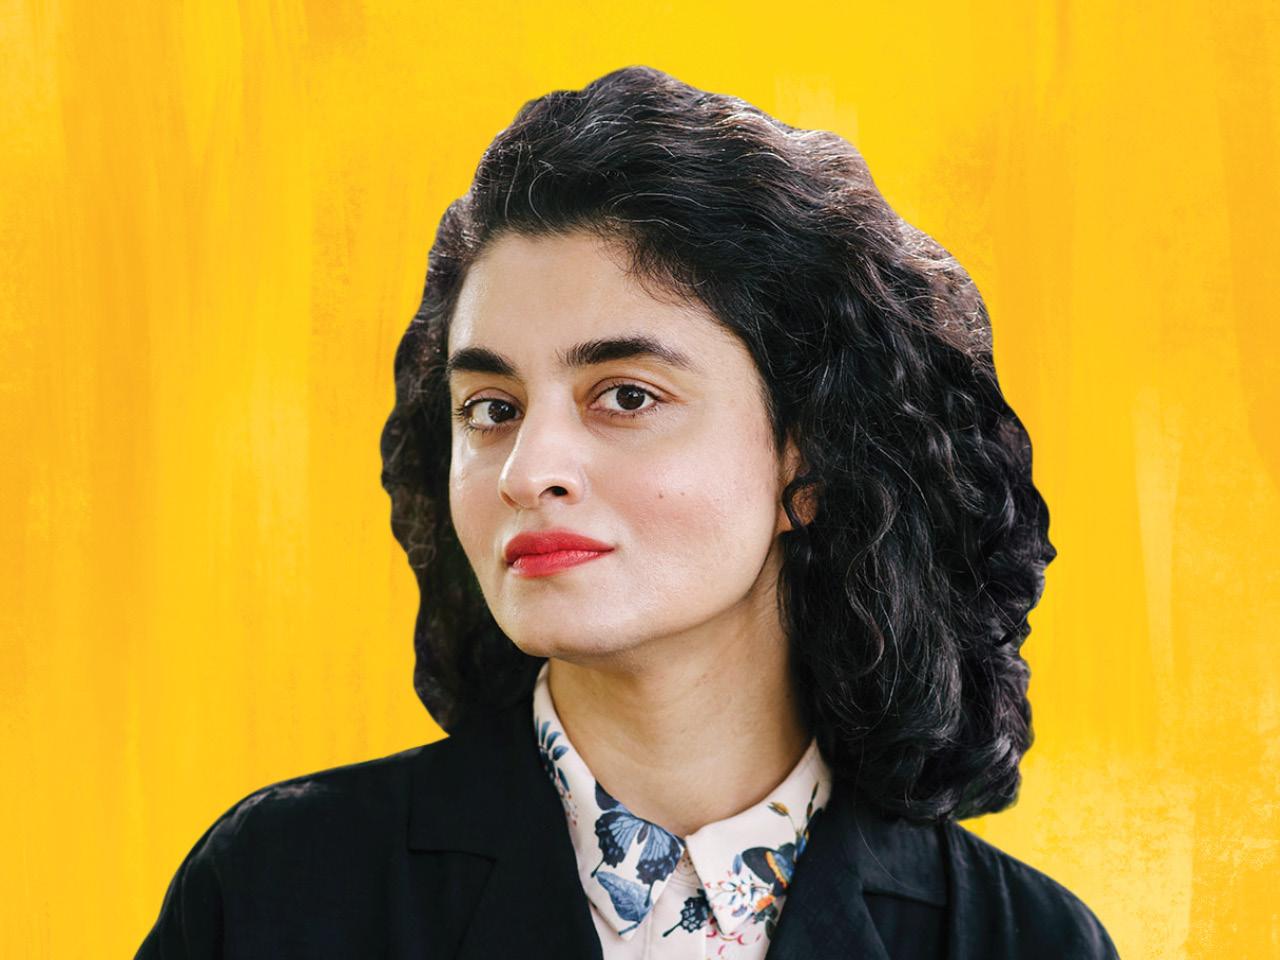 A photo of author and photgrapher Samra Habib on a yellow background